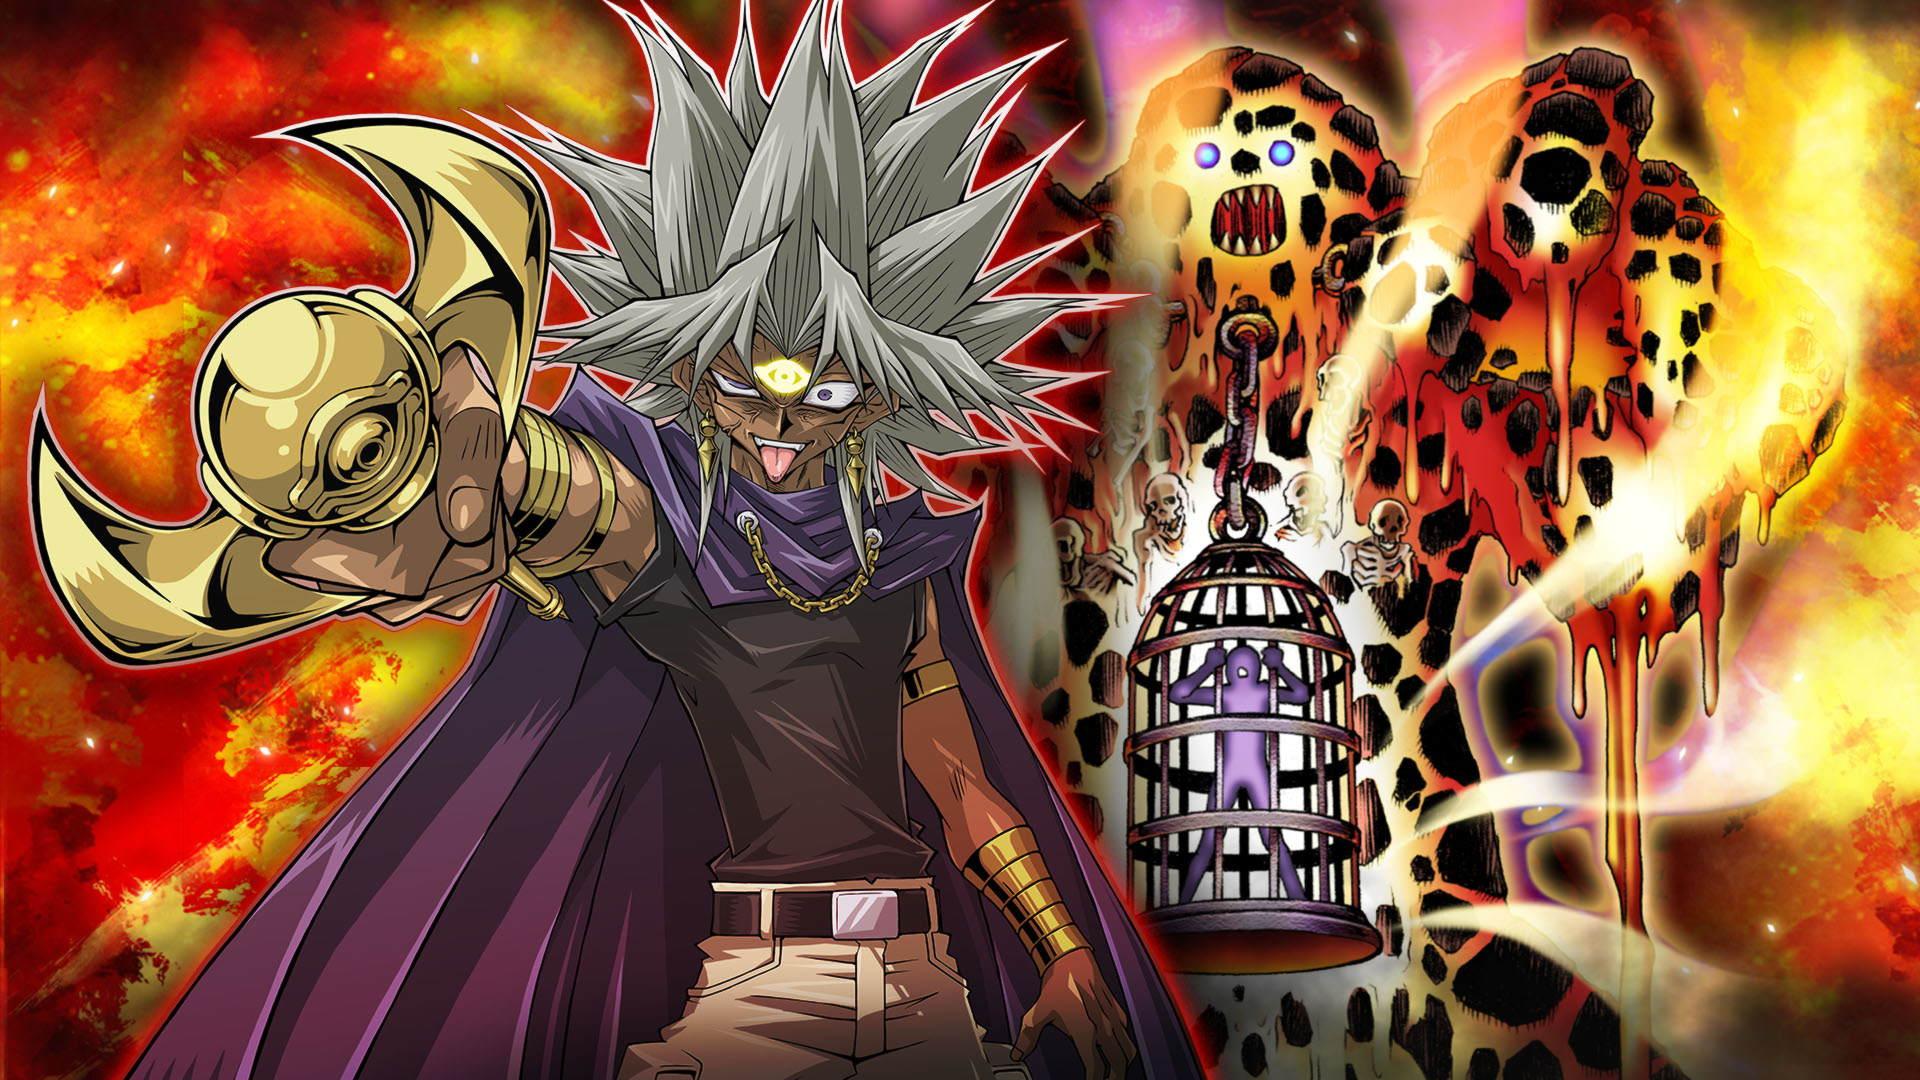 Yu Gi Oh Duel Links Wallpaper 011 Yami Marik Wallpapers